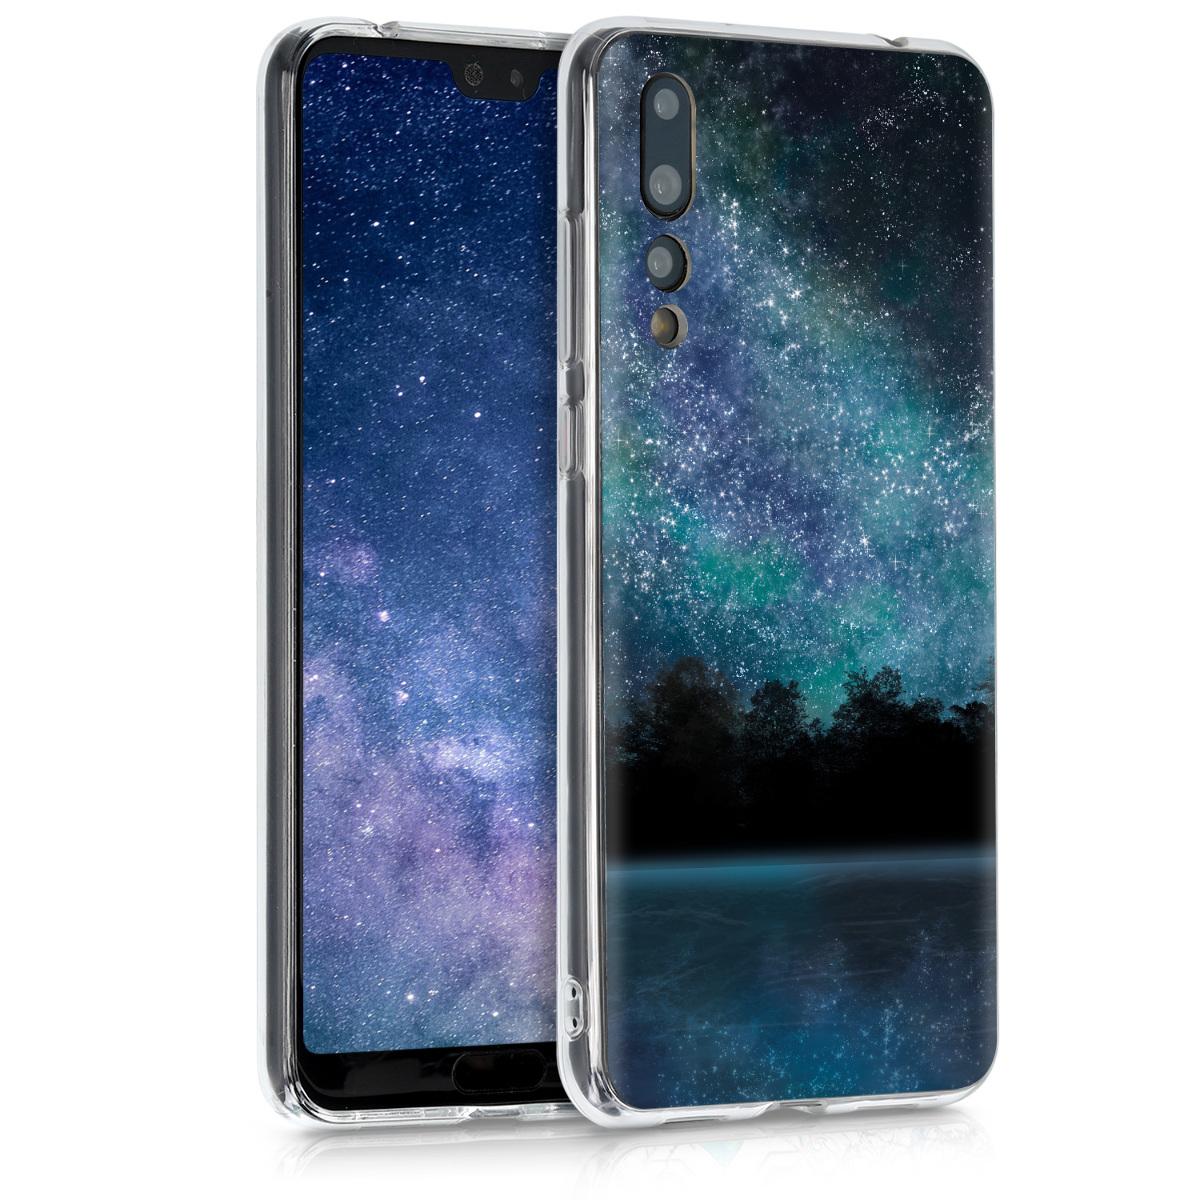 KW Θήκη Σιλικόνης Huawei P20 Pro - Blue / Black (44226.18)